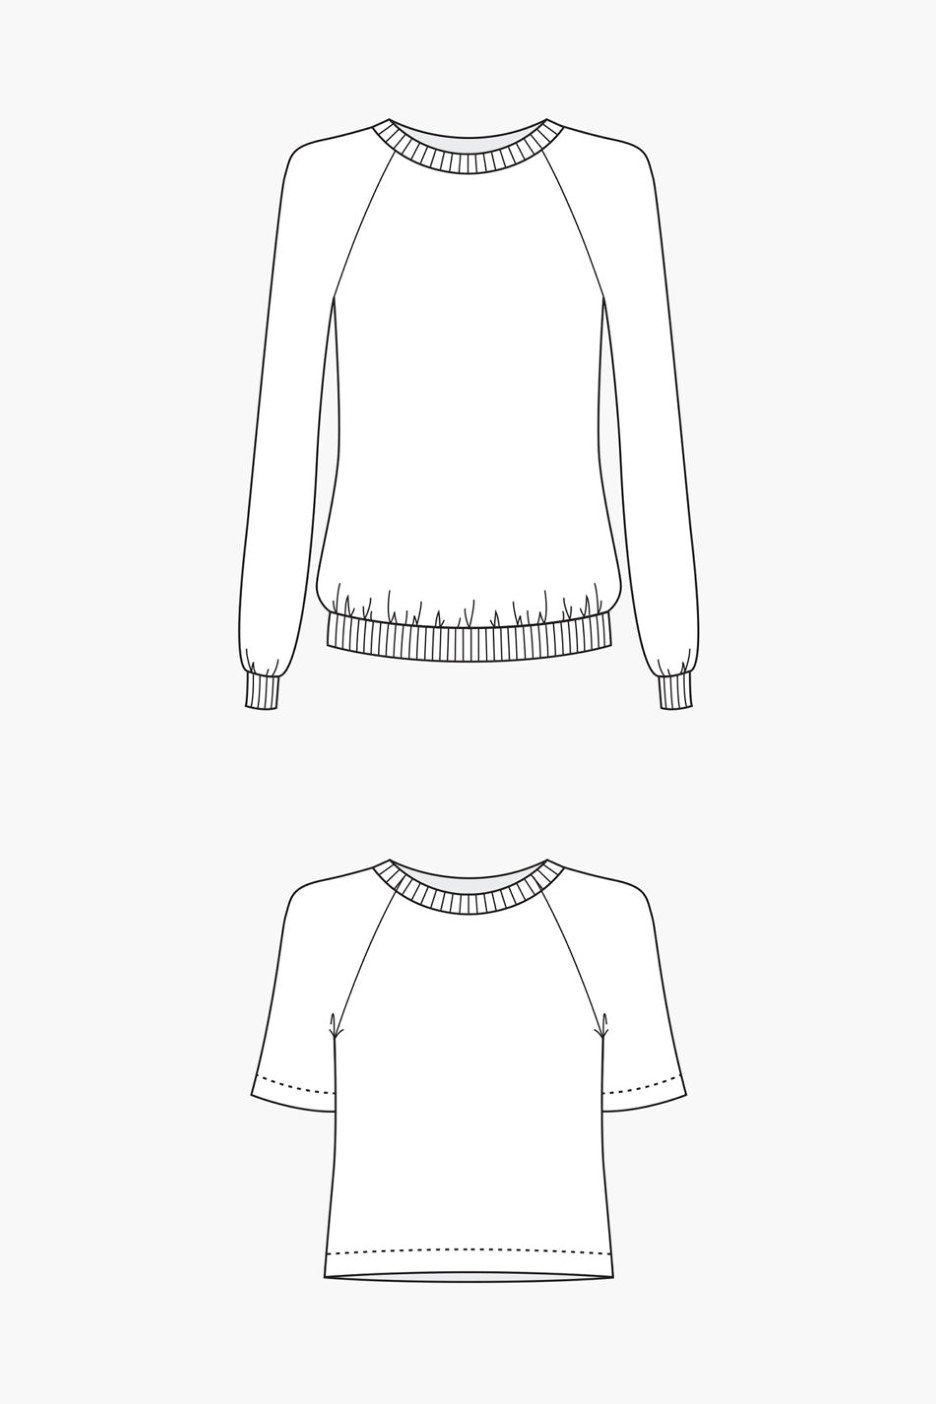 Linden Sweatshirt Sewing Pattern by Grainline Studio   Why Sew ...